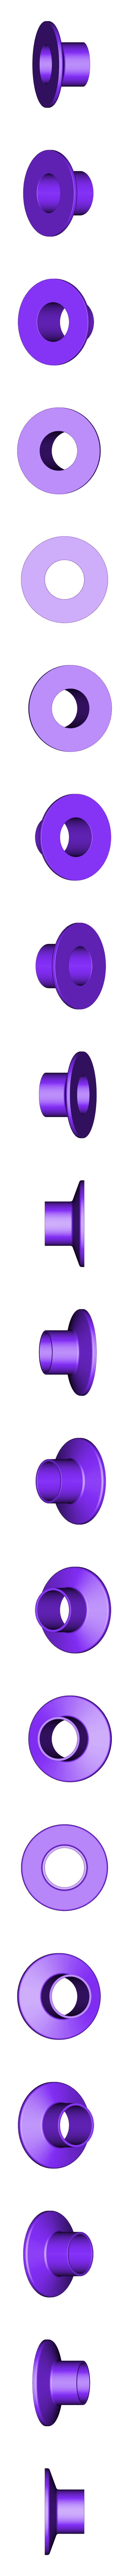 Flange.stl Download free STL file Chain Clamps • 3D printable model, SE_2018